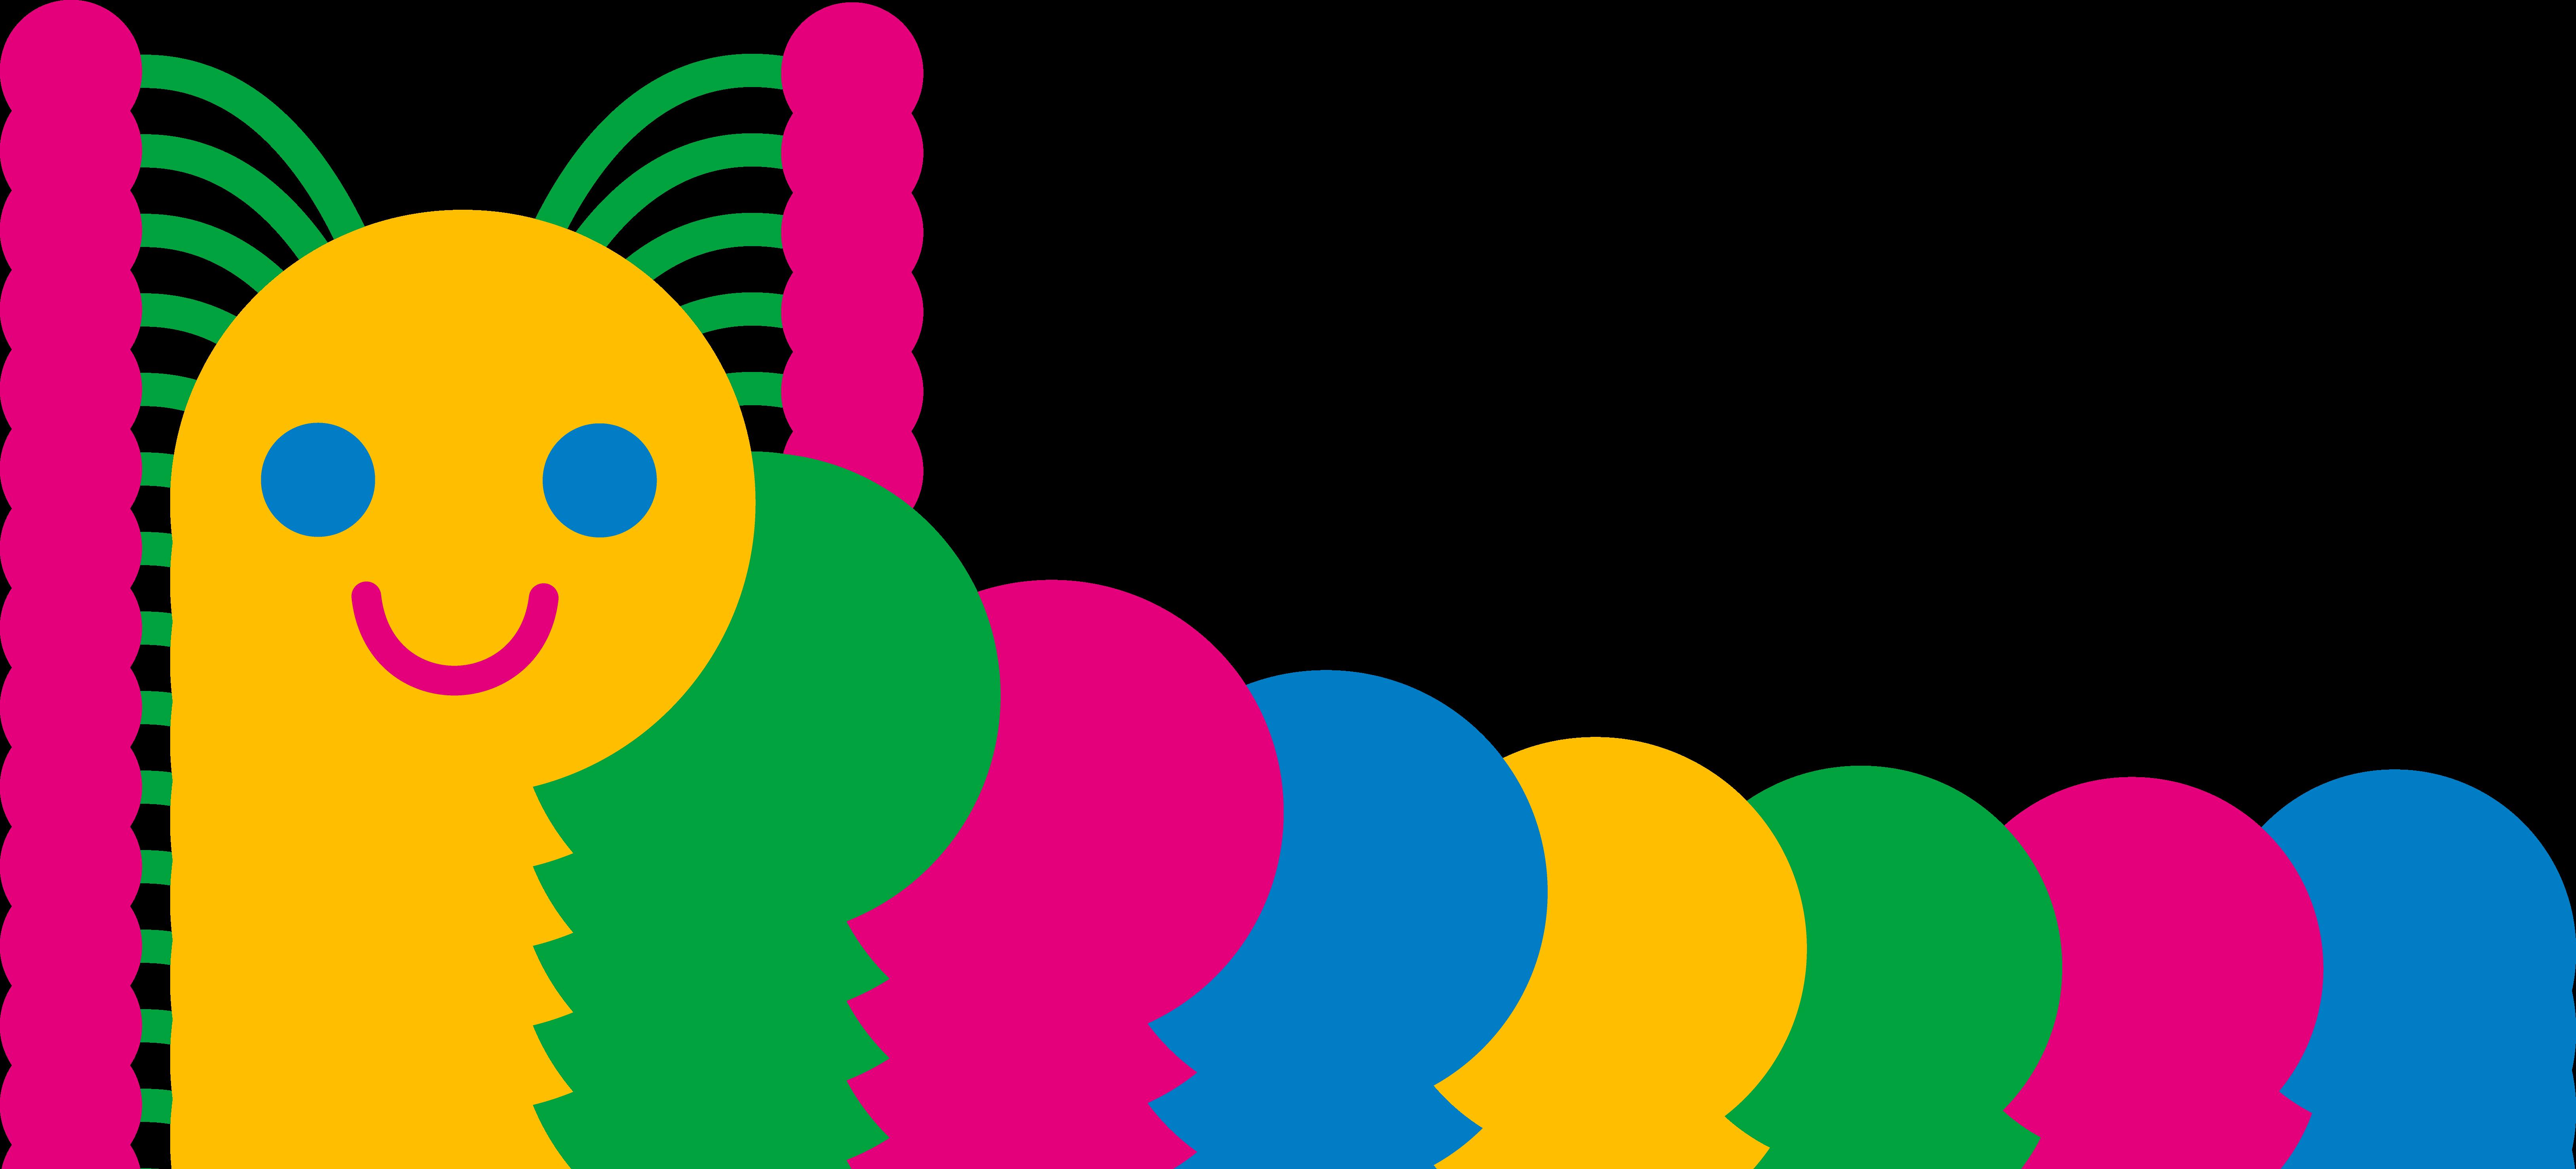 Cute Colorful Caterpillar - Free Clip Art